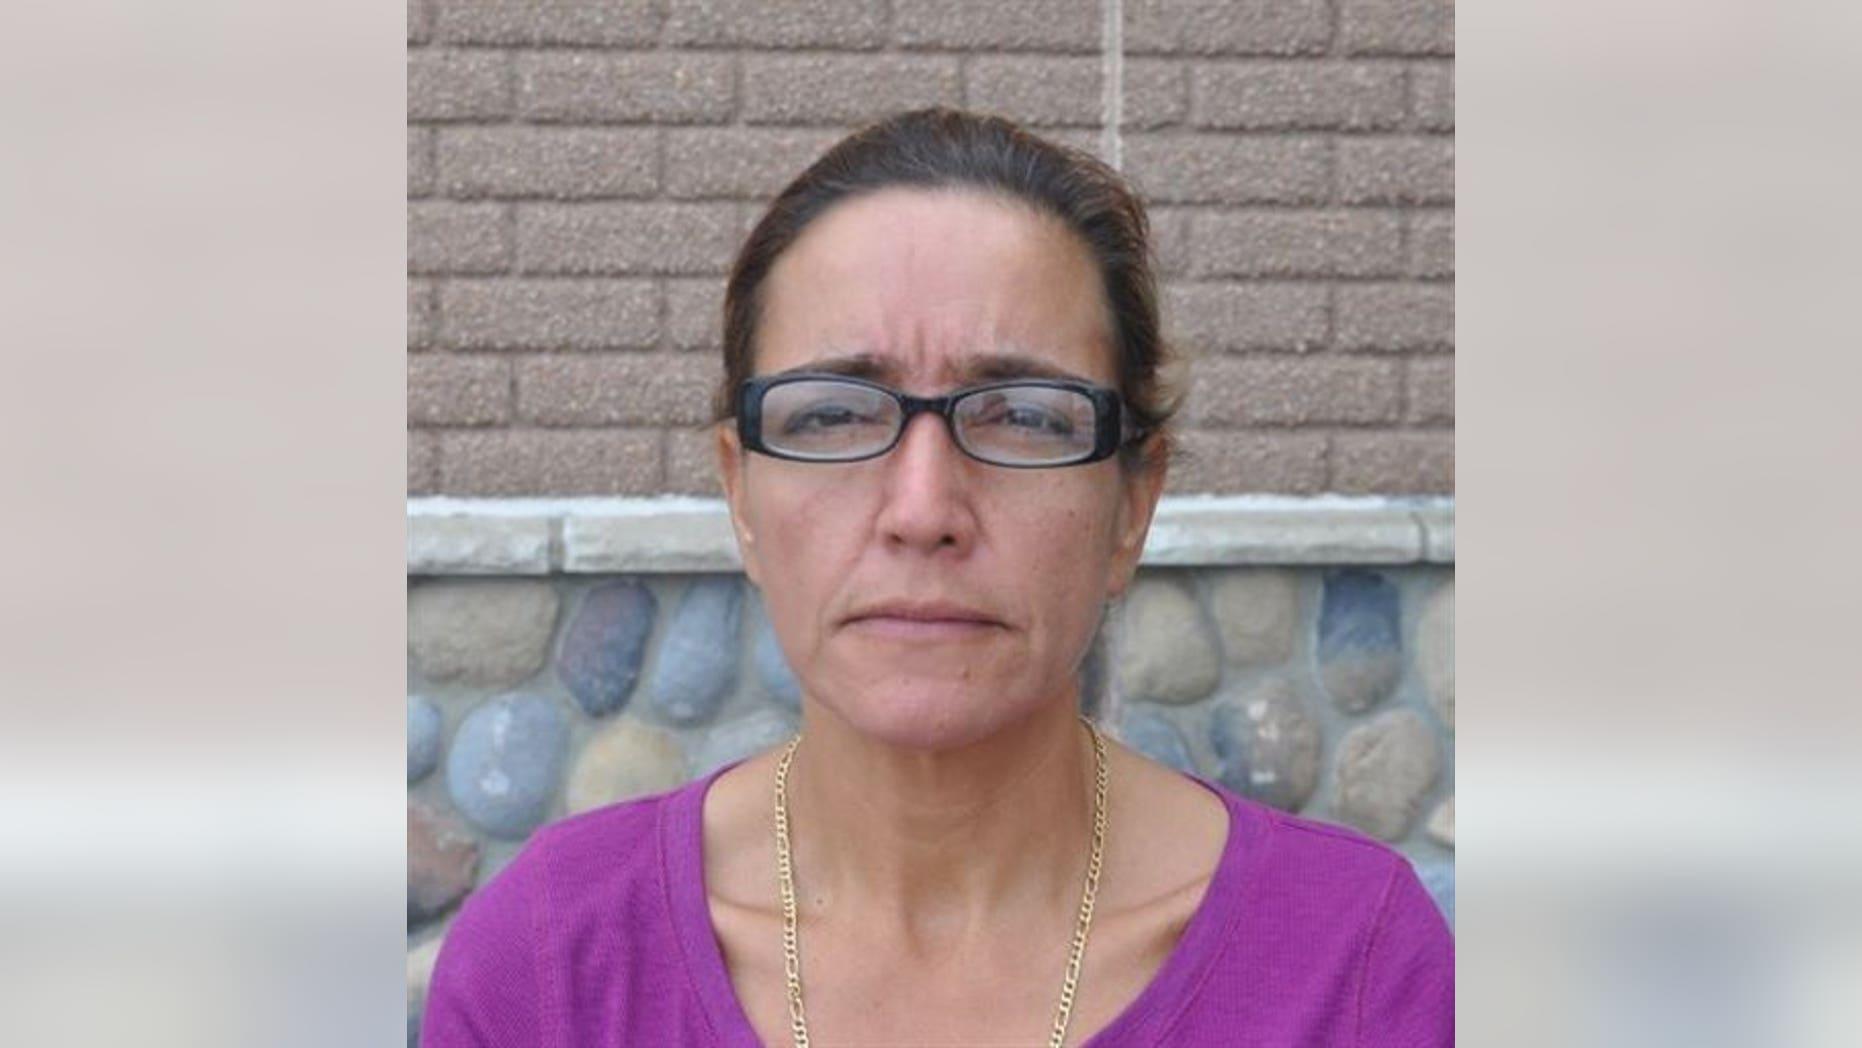 This photo provided by Auburn Hills Police Department shows Tatiana Duva-Rodriguez. (Auburn Hills Police Department via AP)